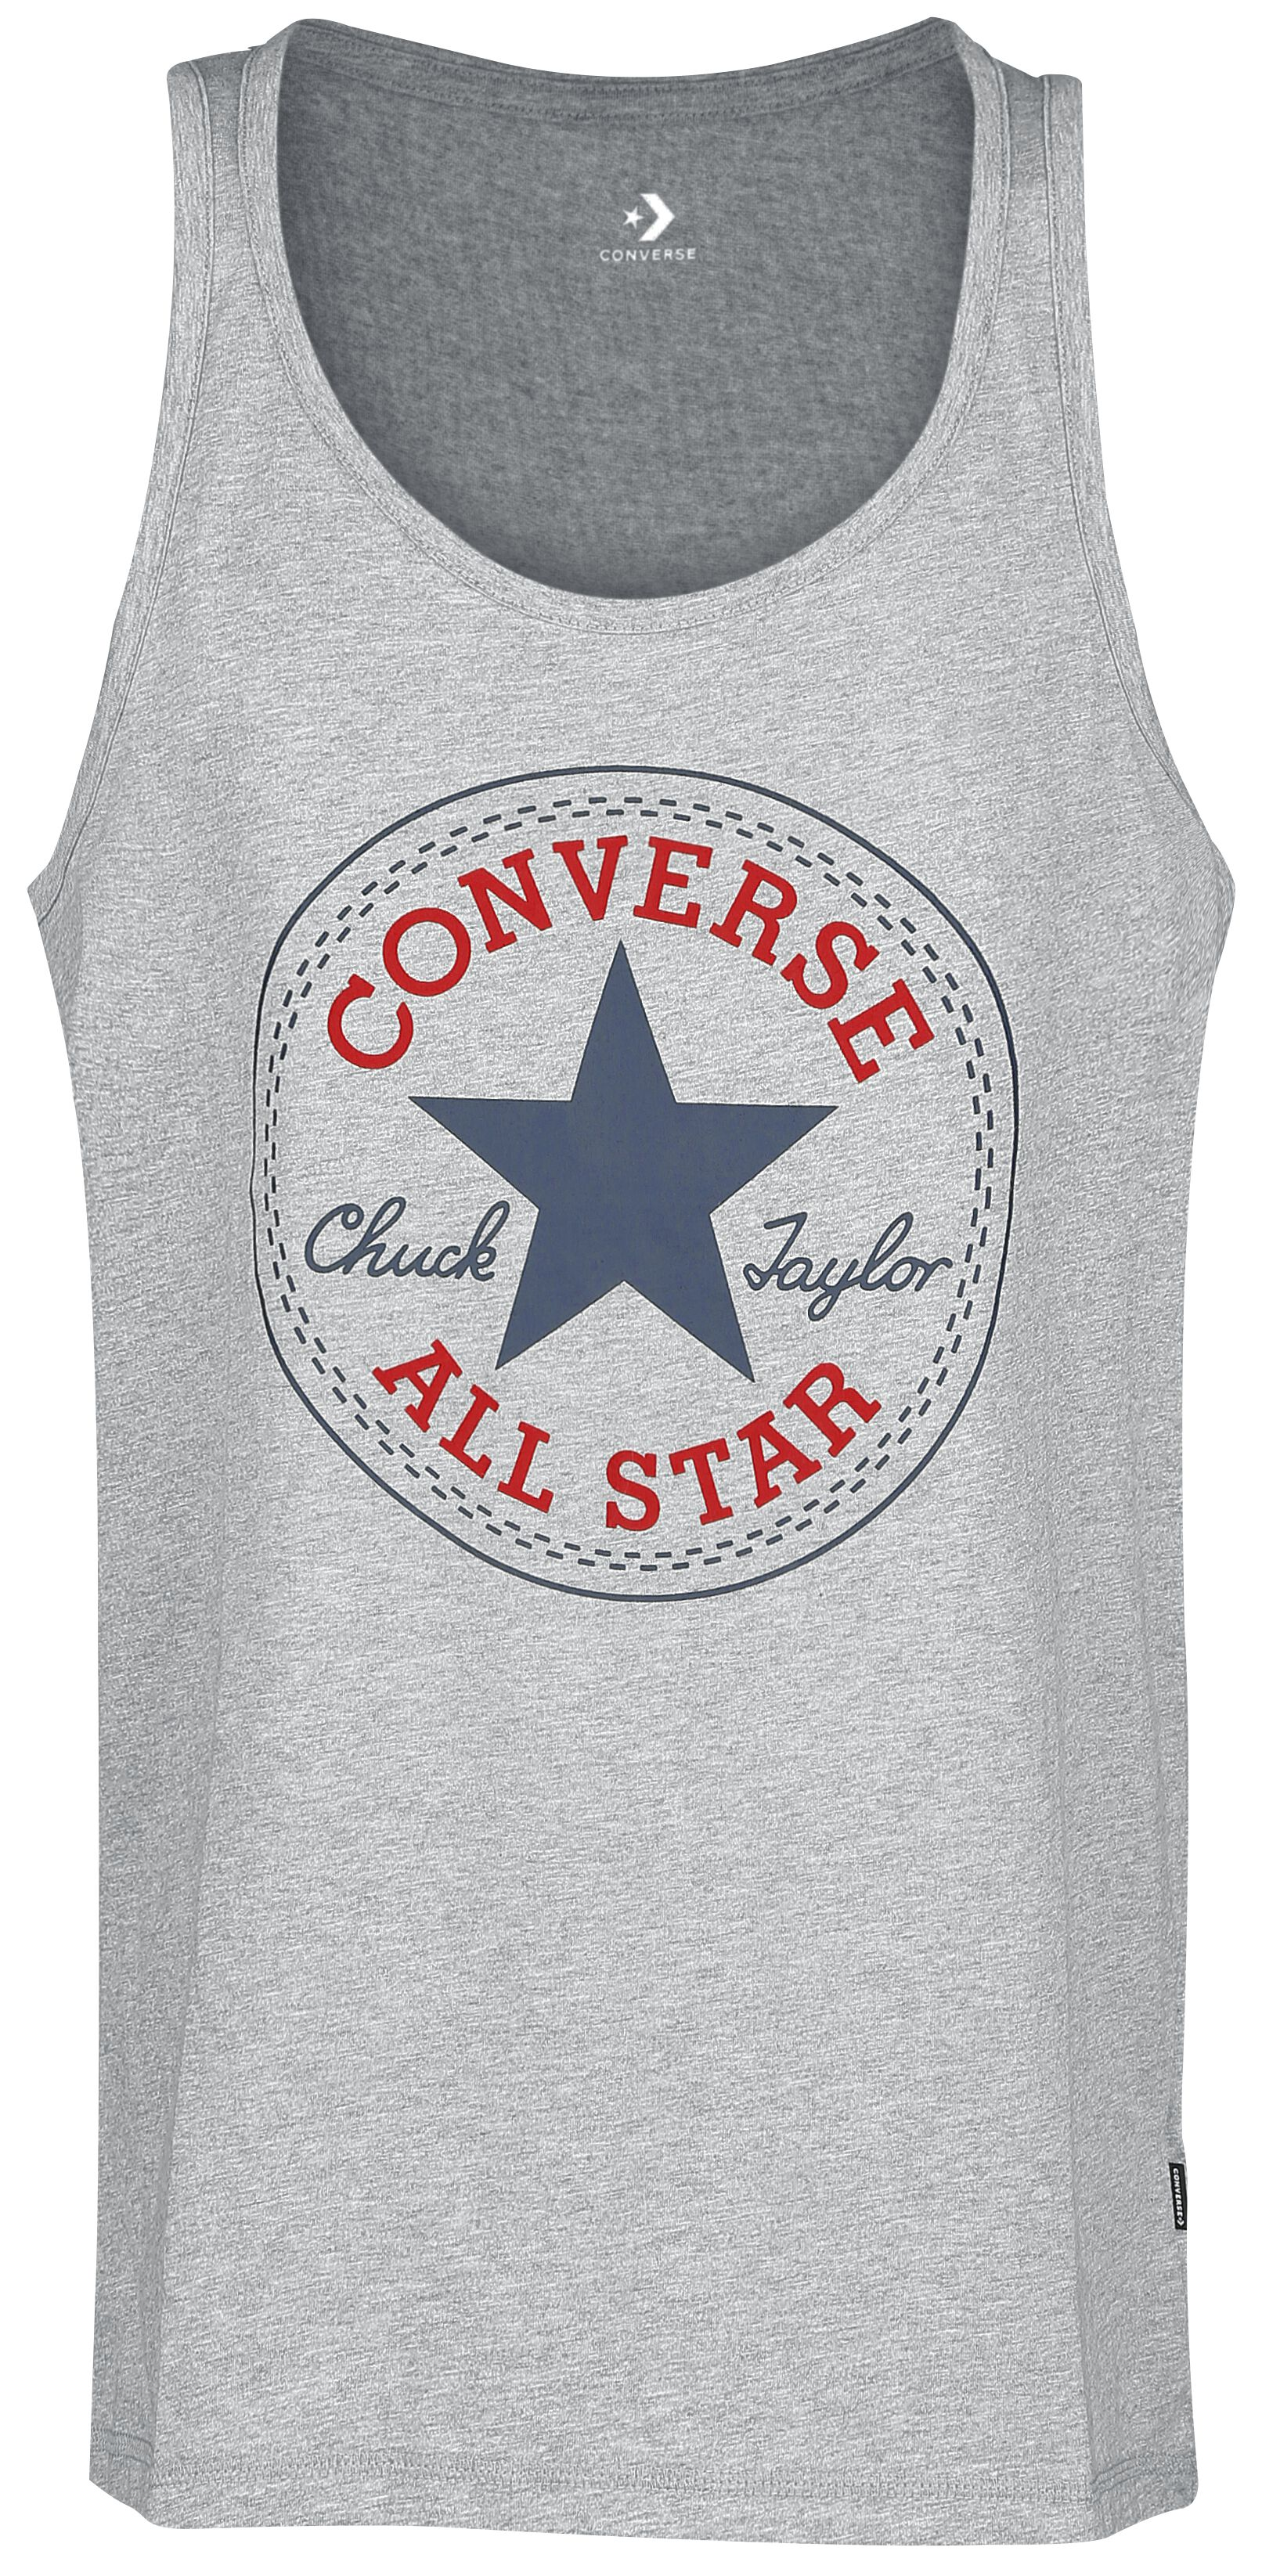 Image of   Converse Chuck Patch Tank Tanktop grå